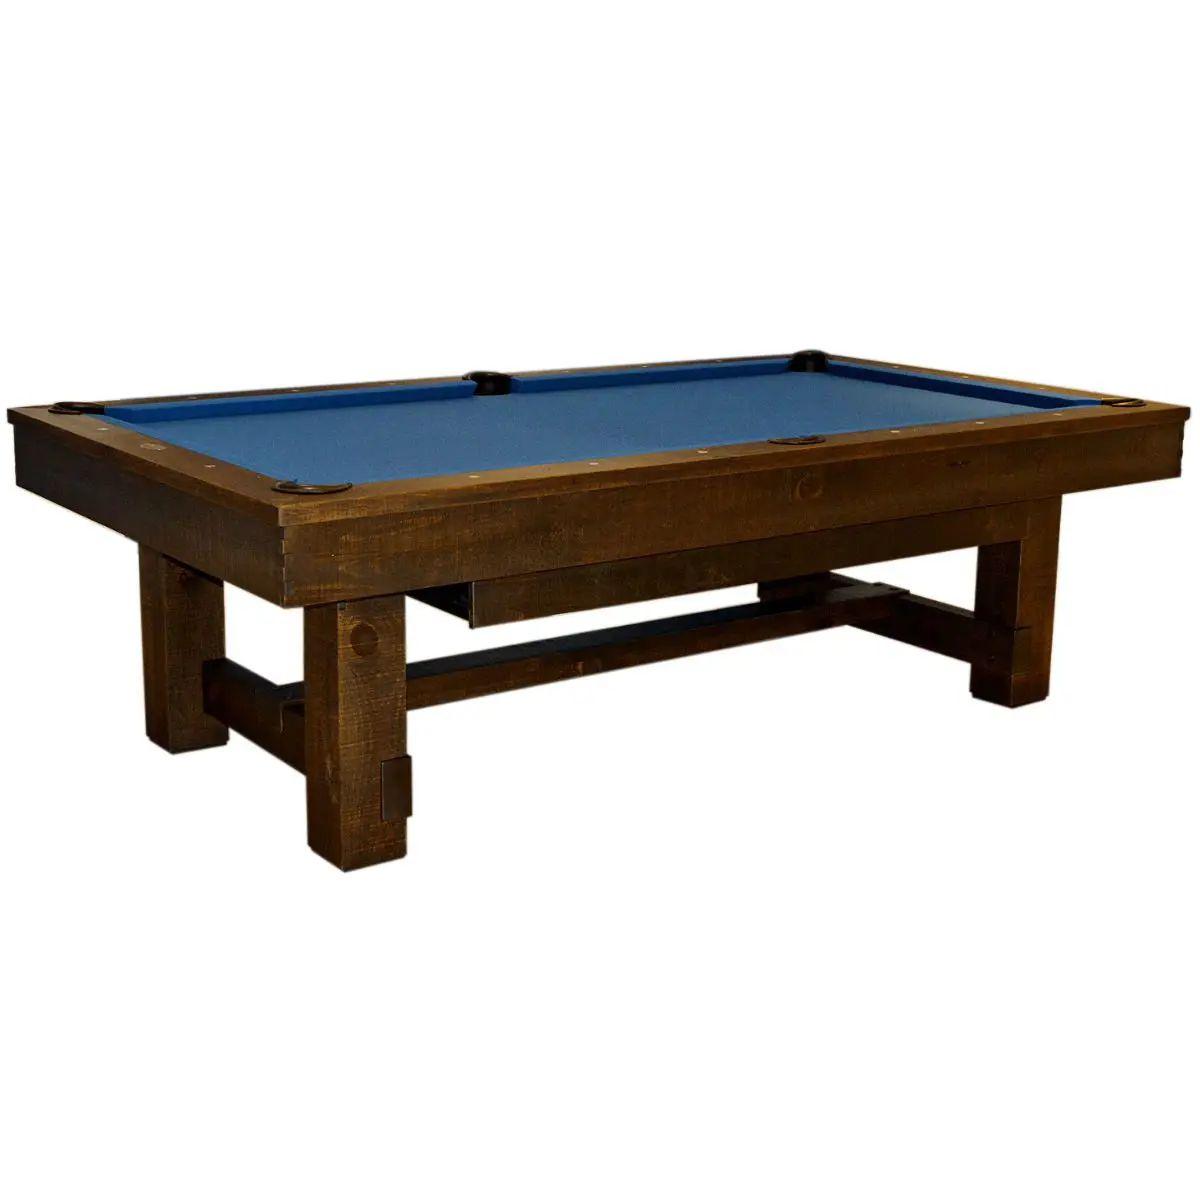 New breckenridge pool table olhausen montgomeryville pa